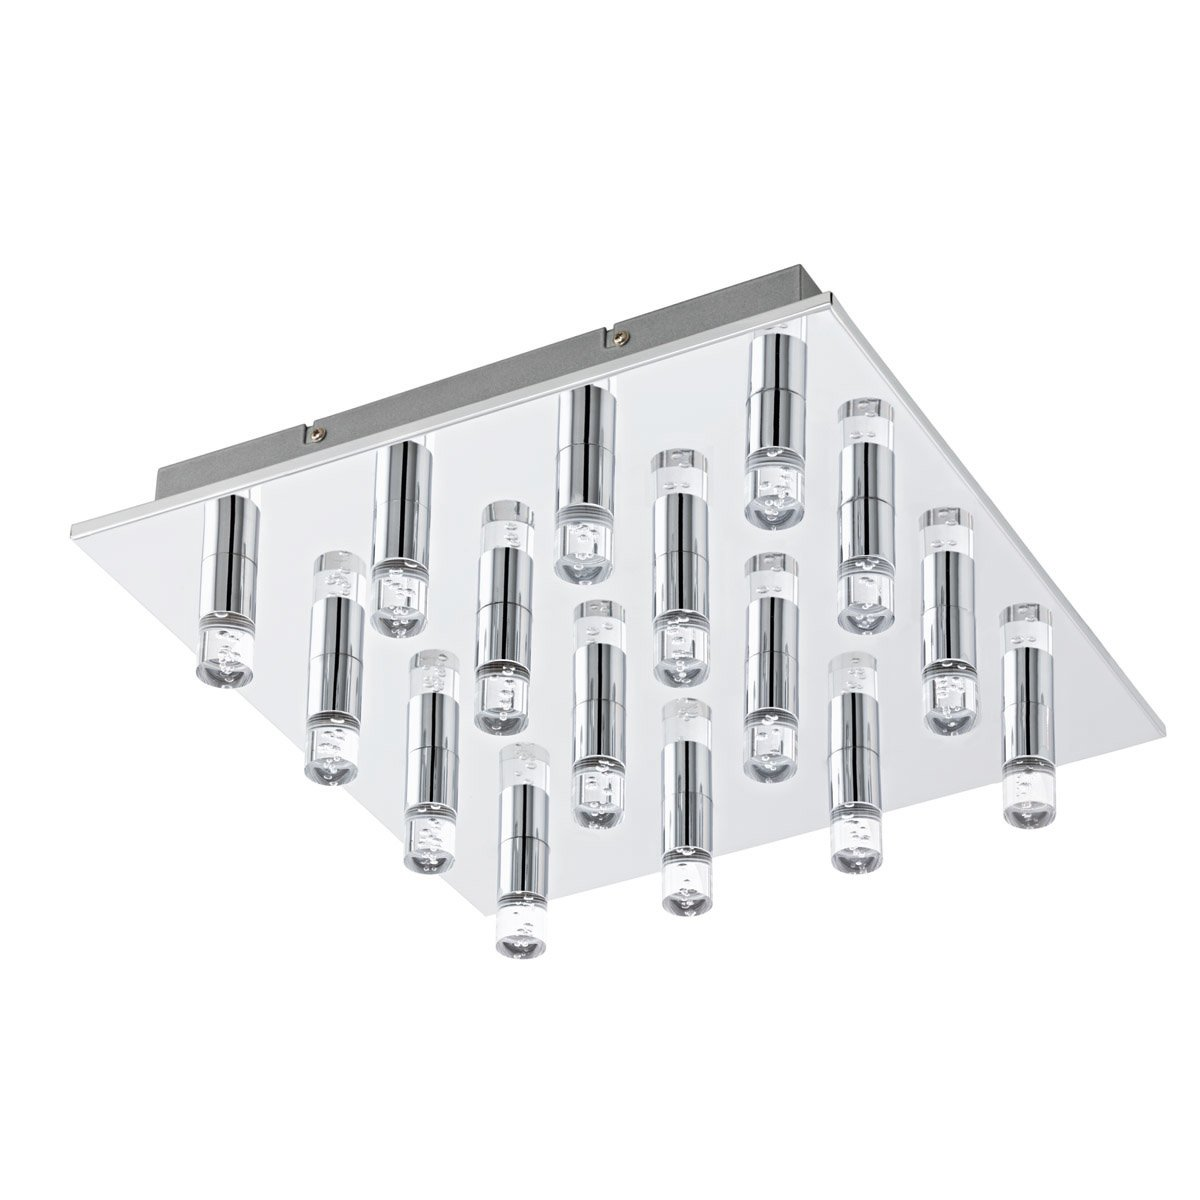 Eglo Design plafondlamp Teocelo Eglo 95363